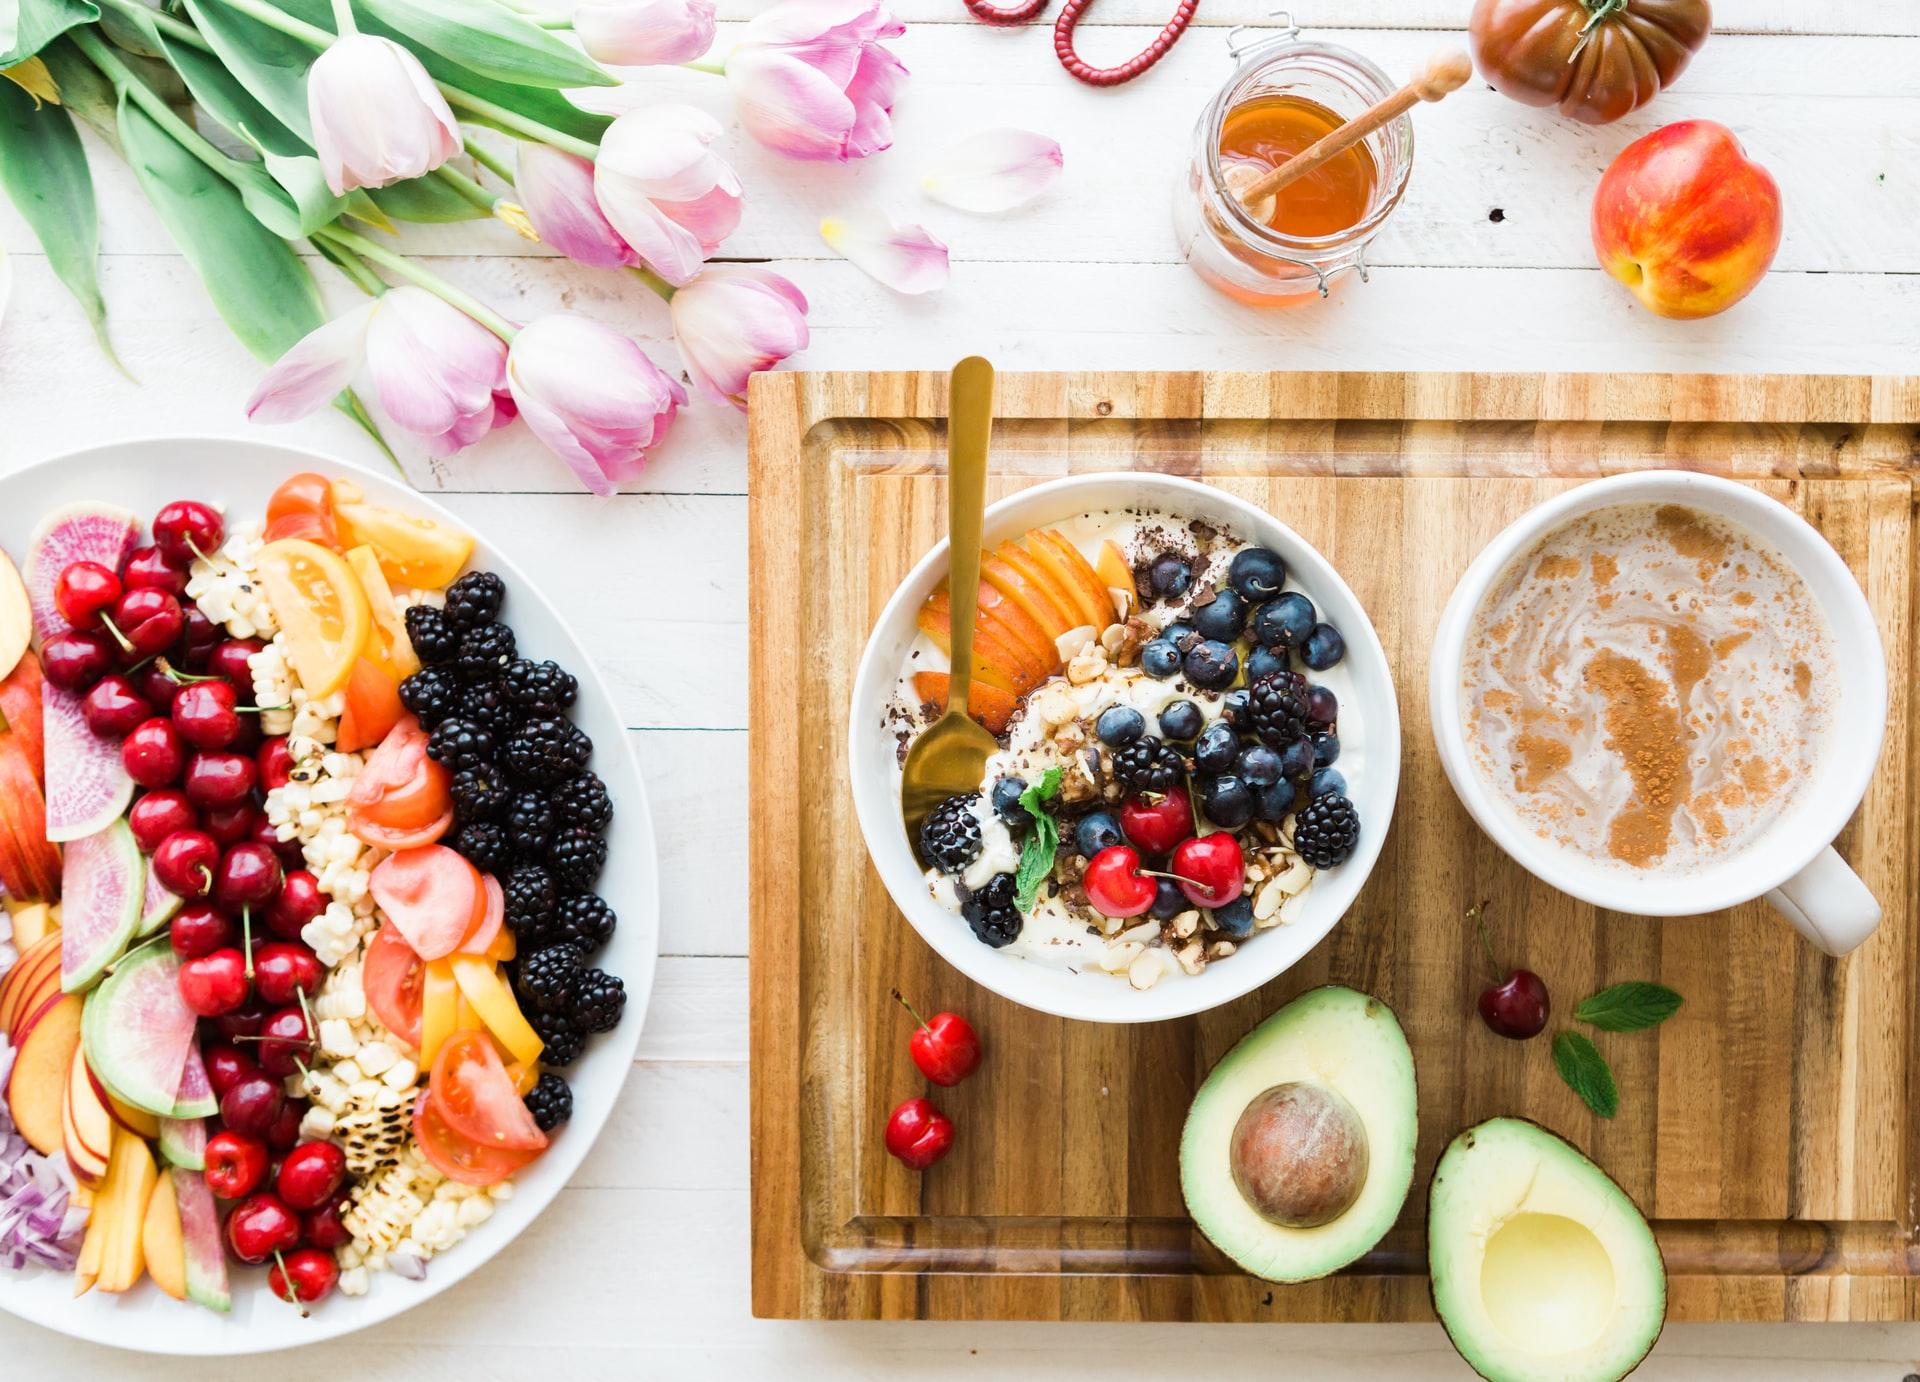 dieta a base di frutta e verdura per perdere peso